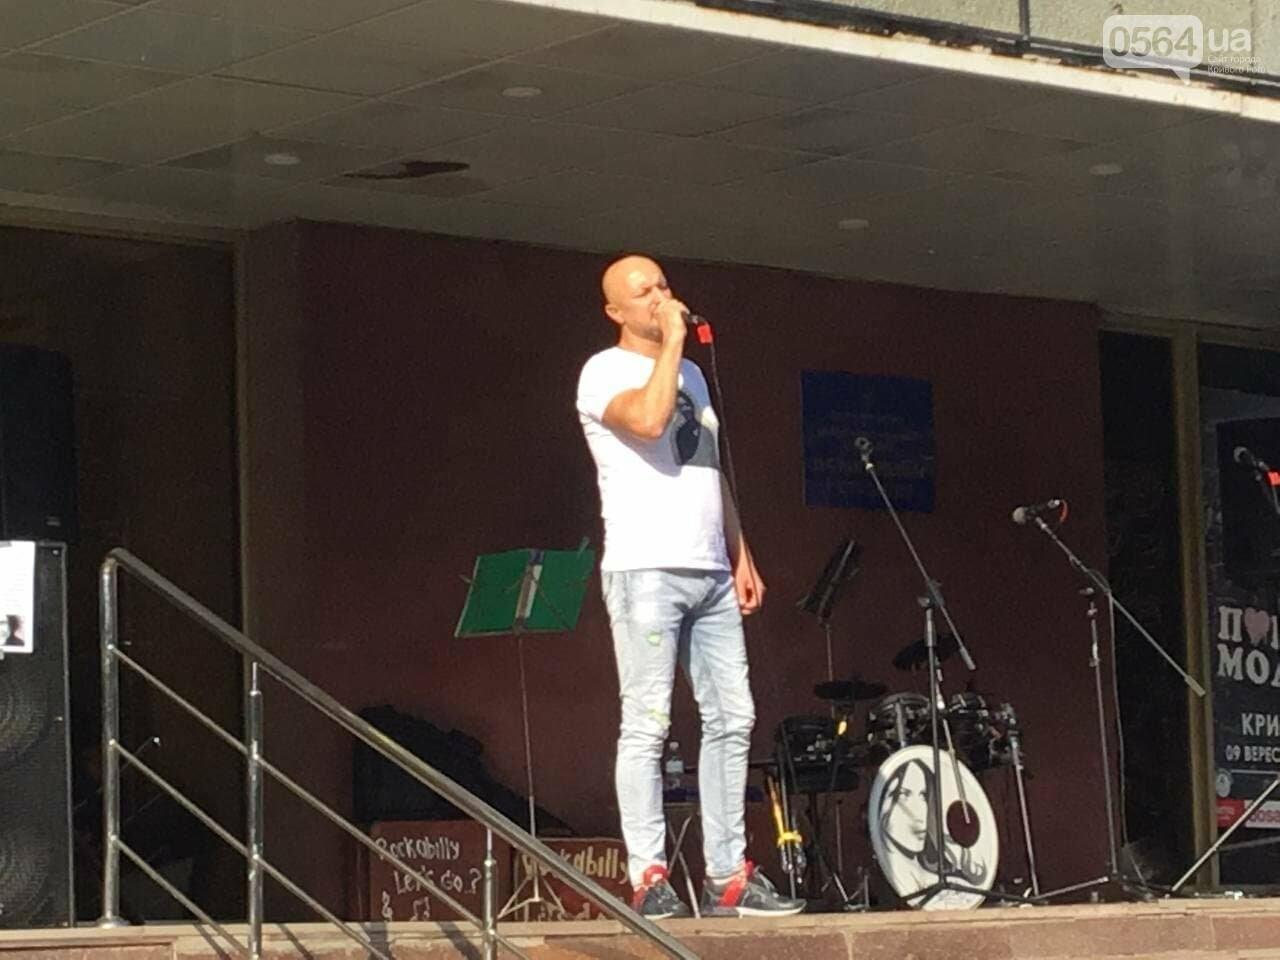 18 конкурсантов представили своё творчество на 5-м Криворожском фестивале имени Кузьмы Скрябина, - ФОТО, ВИДЕО, фото-14